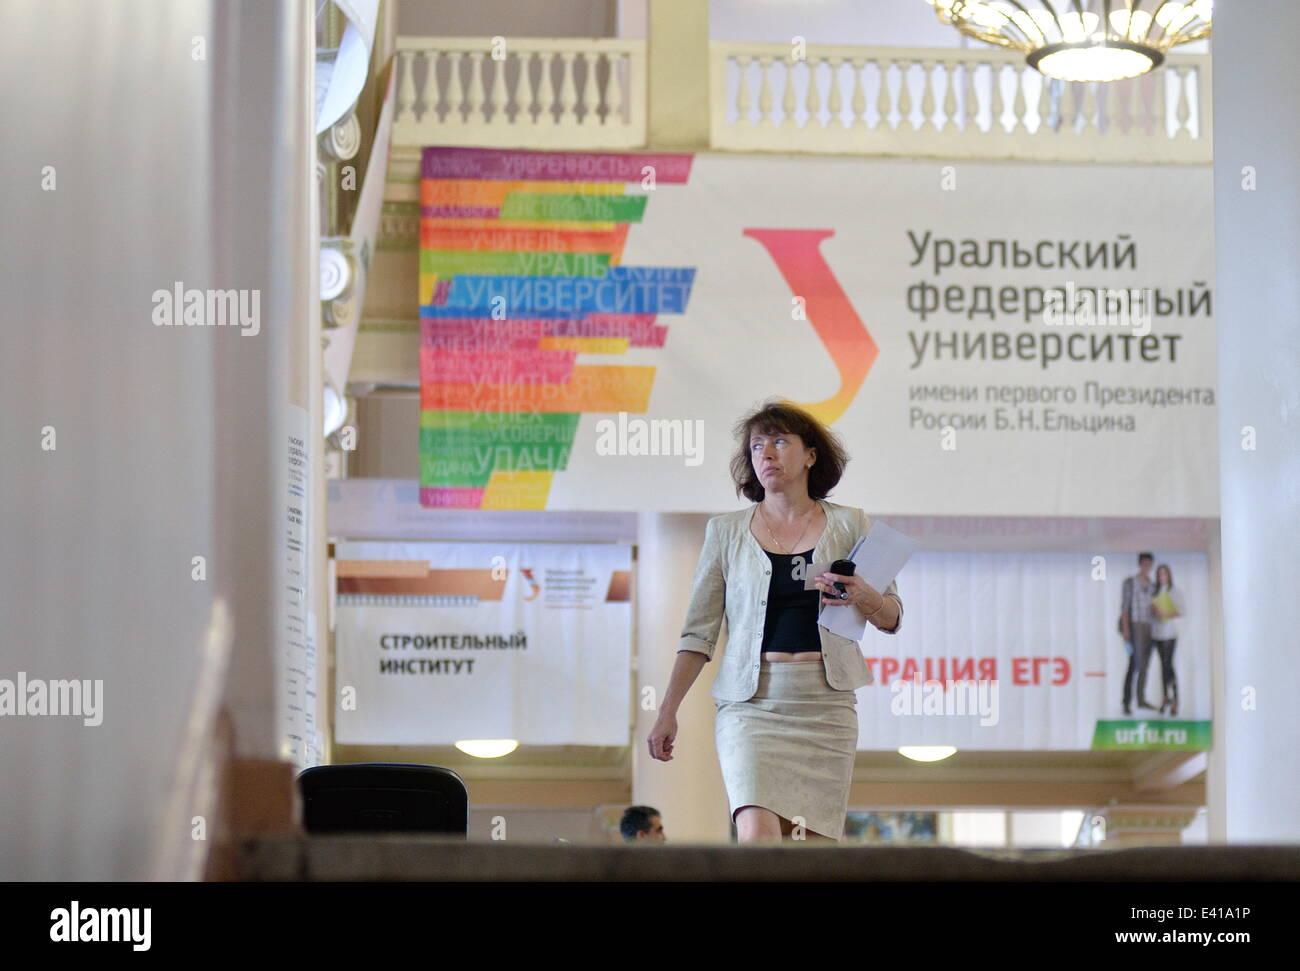 Yekaterinburg, Russia. 2nd July, 2014. At the Ural Federal University. © Anton Butsenko/ITAR-TASS/Alamy Live - Stock Image